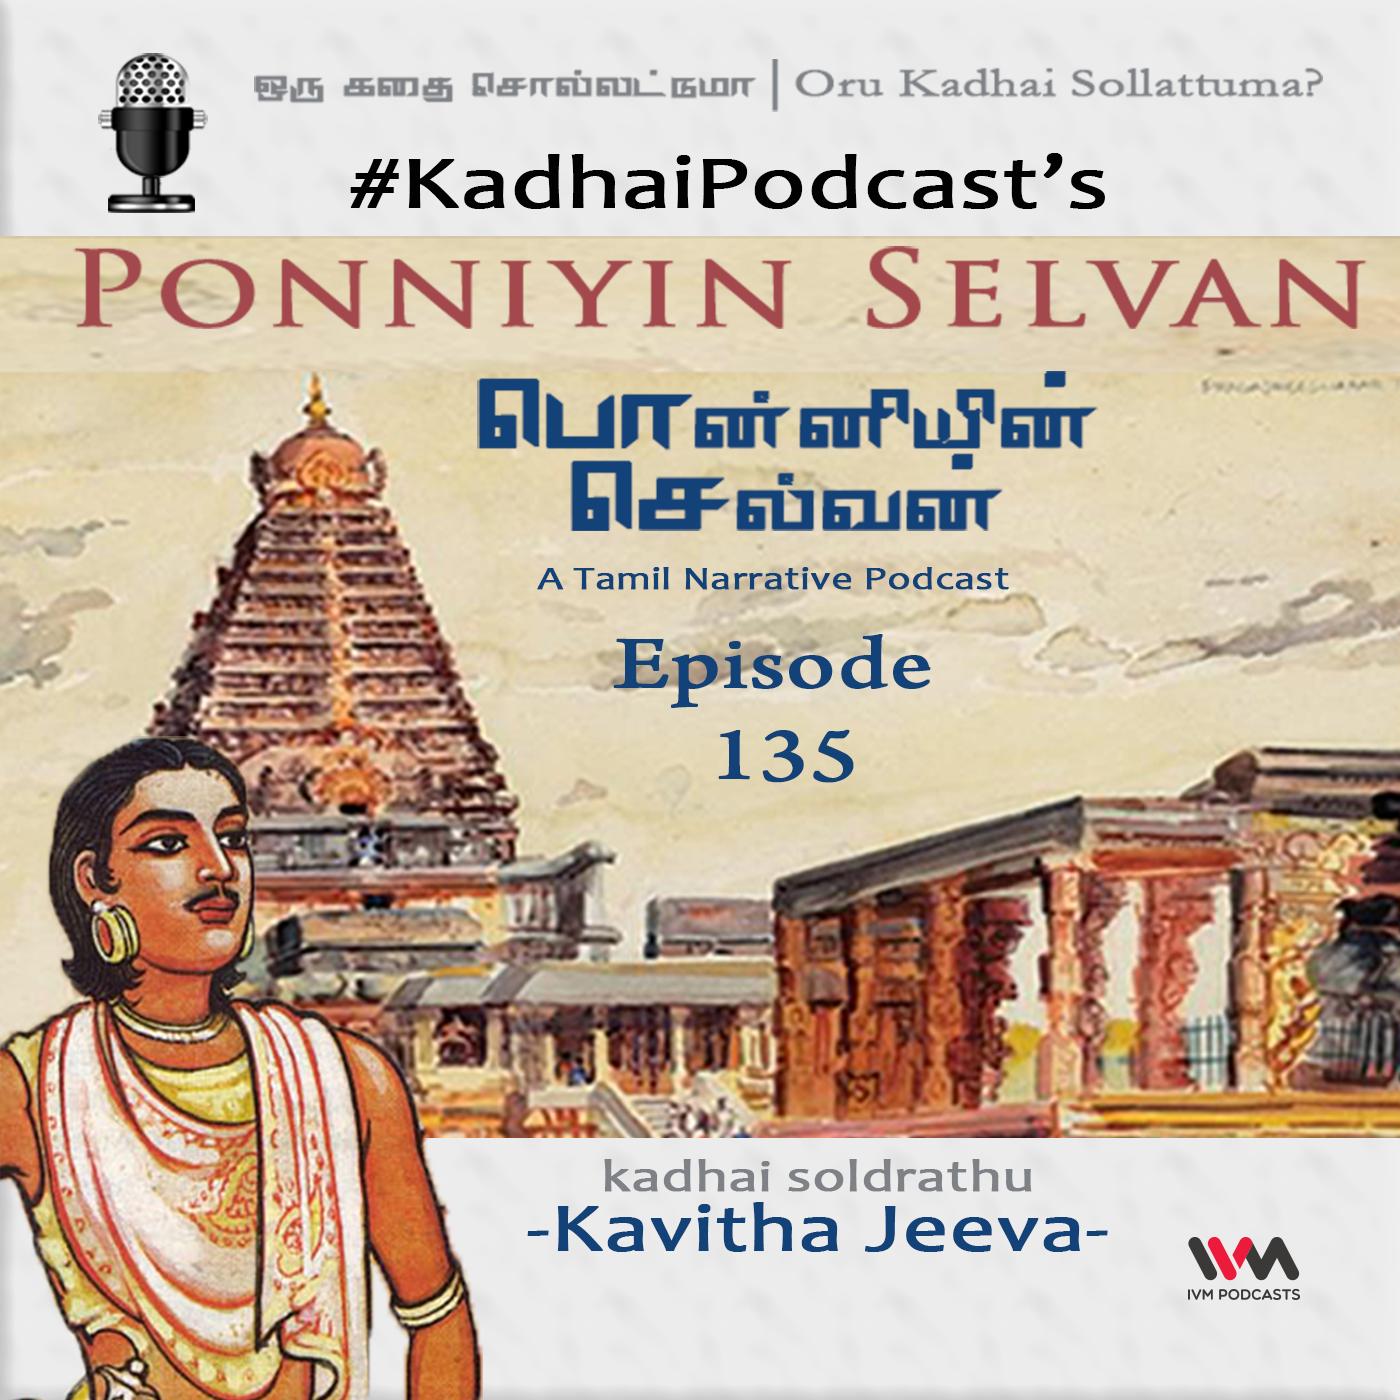 KadhaiPodcast's Ponniyin Selvan - Episode # 135